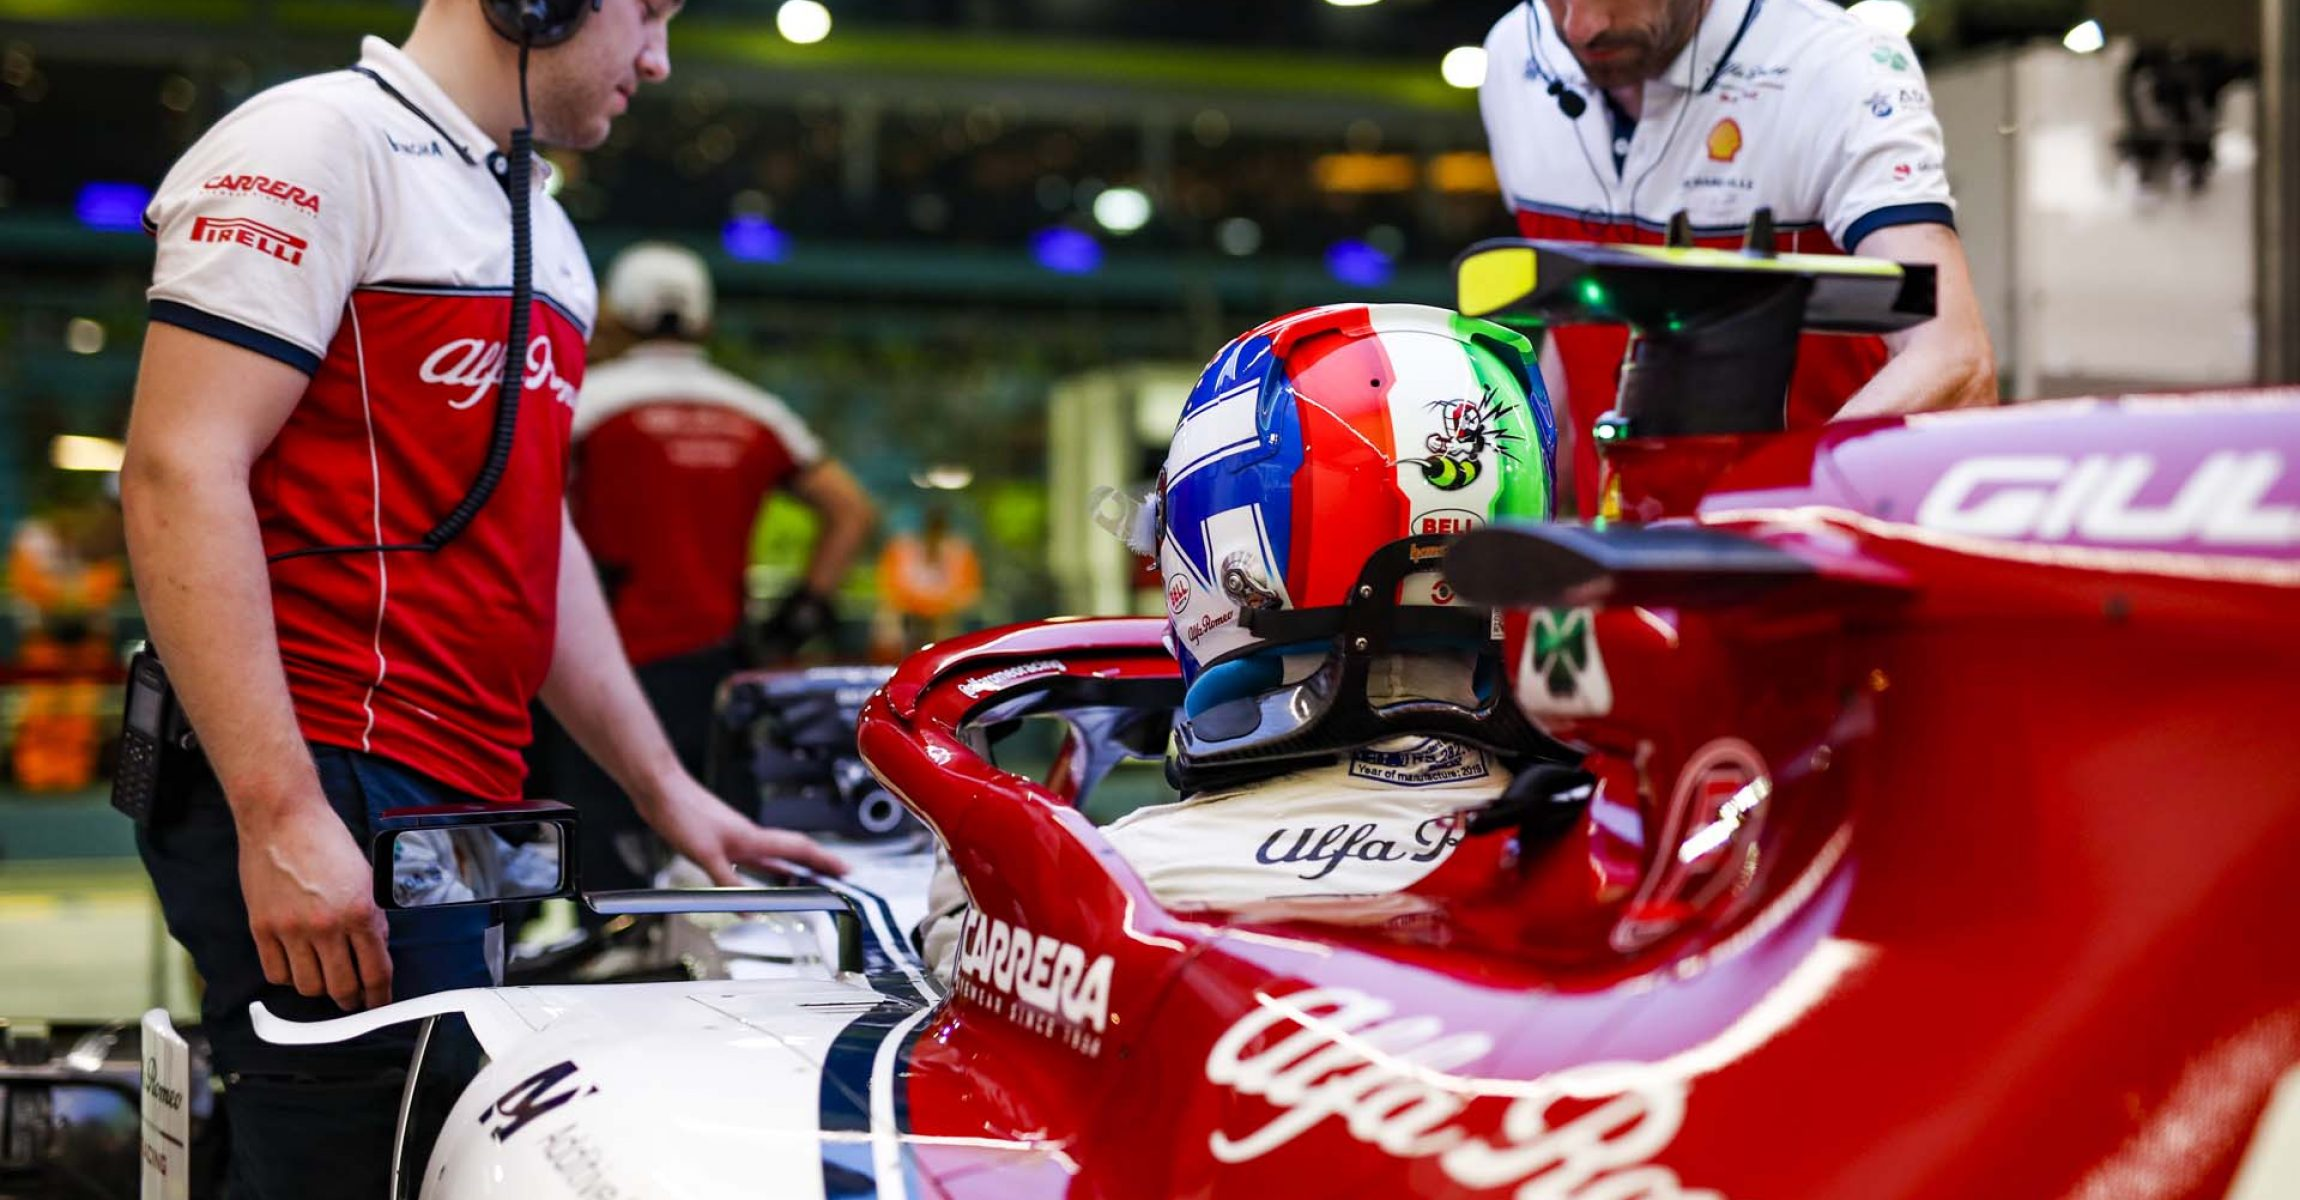 GIOVINAZZI Antonio (ita), Alfa Romeo Racing C38, portrait during the 2019 Formula One World Championship, Singapore Grand Prix from September 19 to 22 in Singapour - Photo Florent Gooden / DPPI